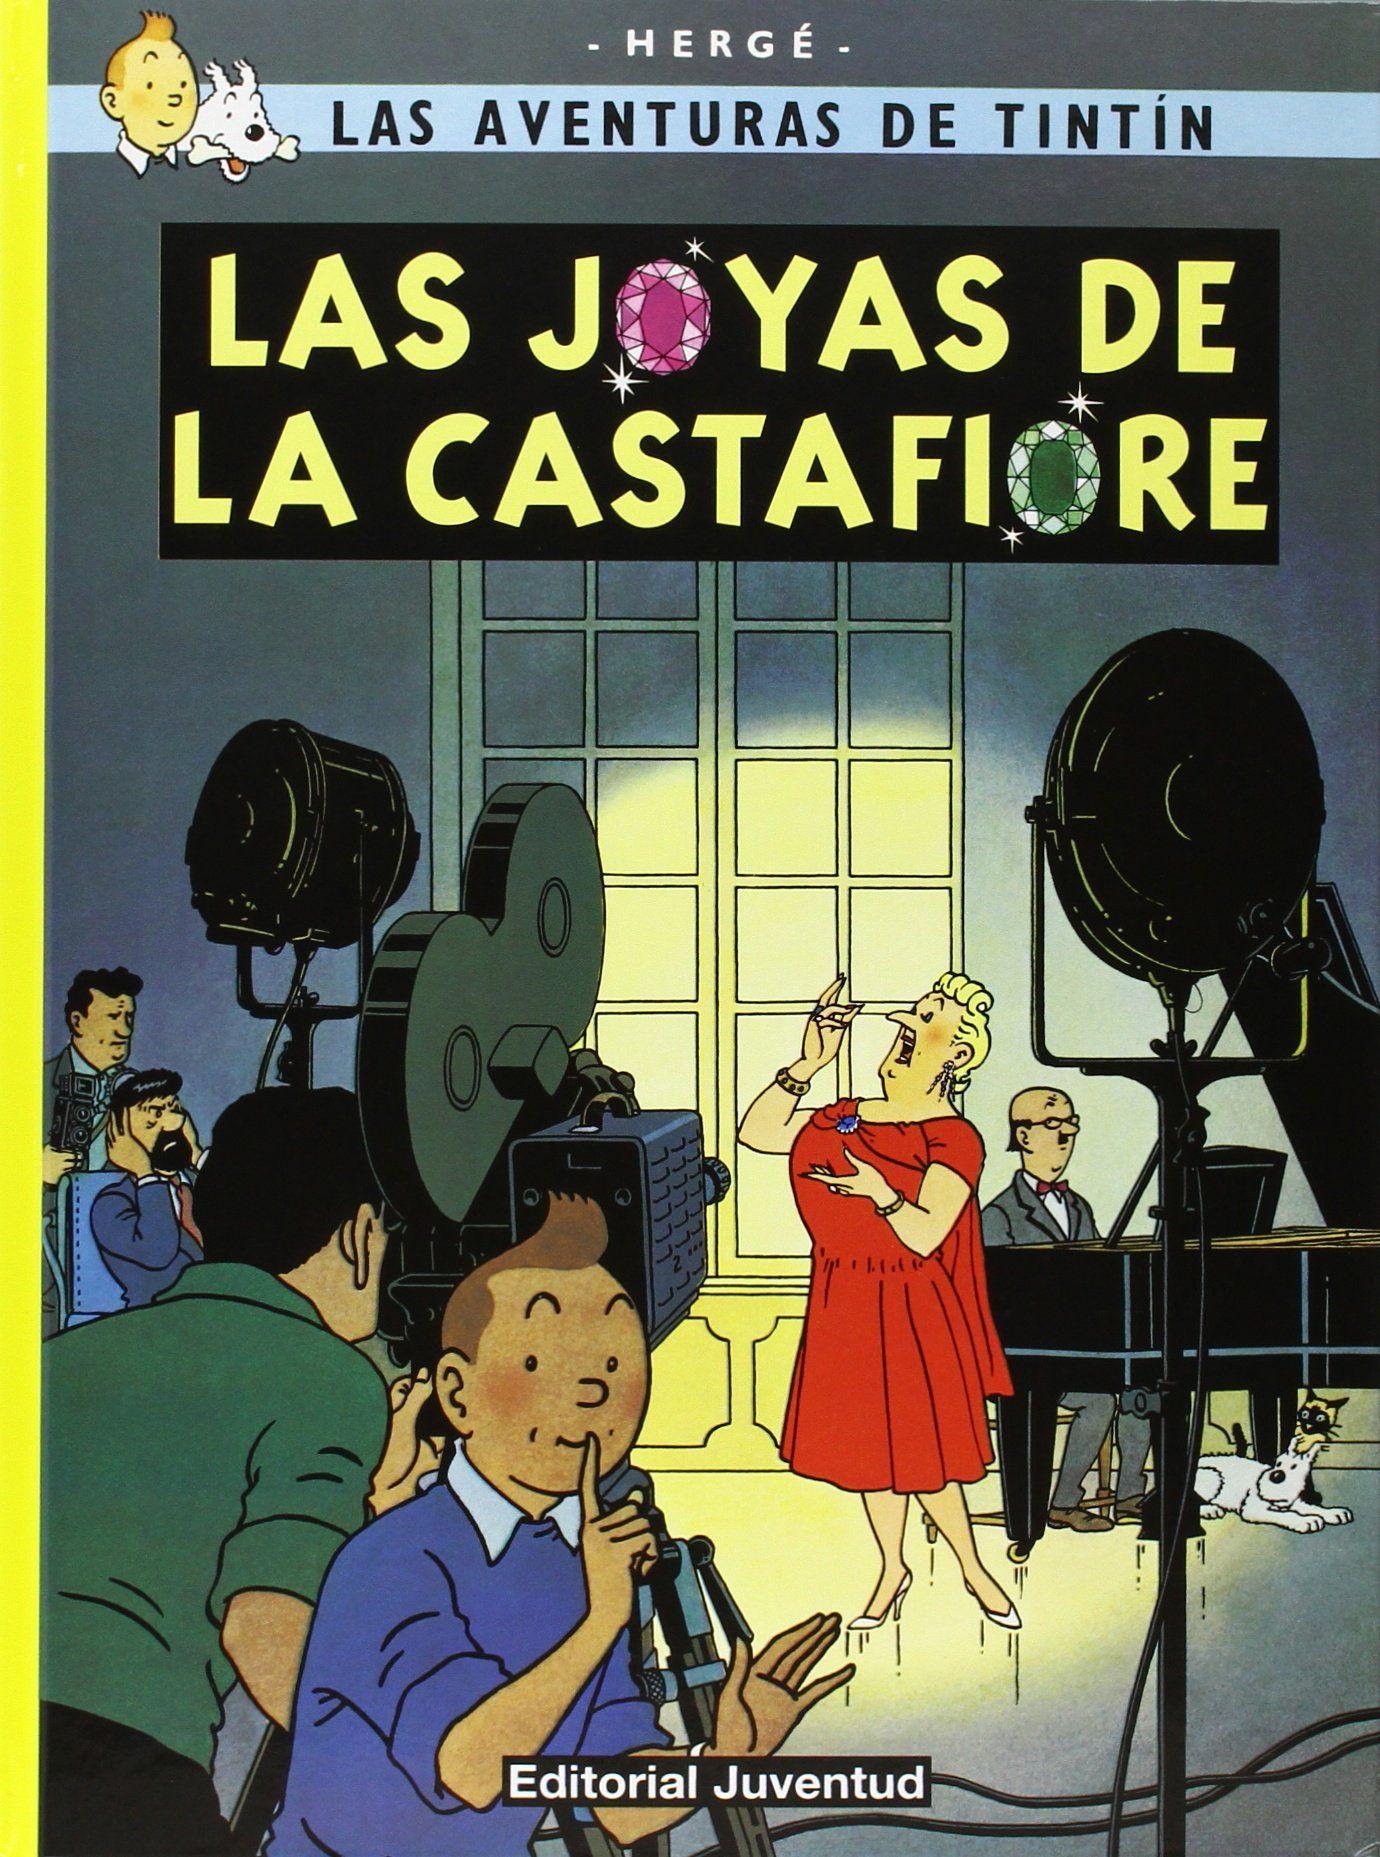 Las Joyas De La Castafiore Herge Las Aventuras De Tintin Tintin Portadas De Libros